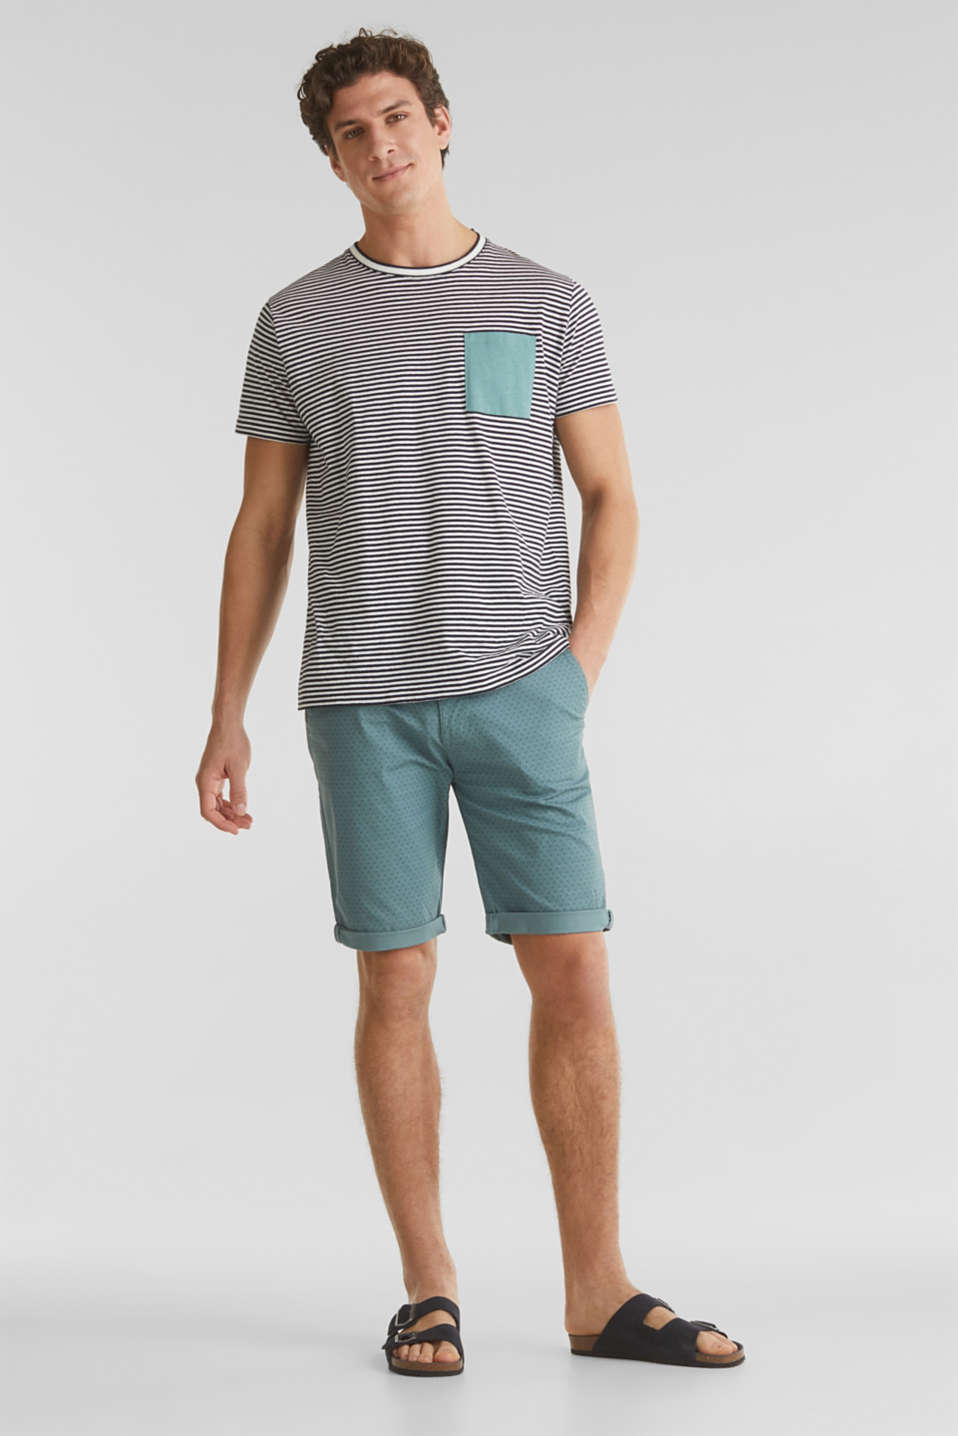 Organic cotton Shorts + belt, TEAL GREEN, detail image number 1